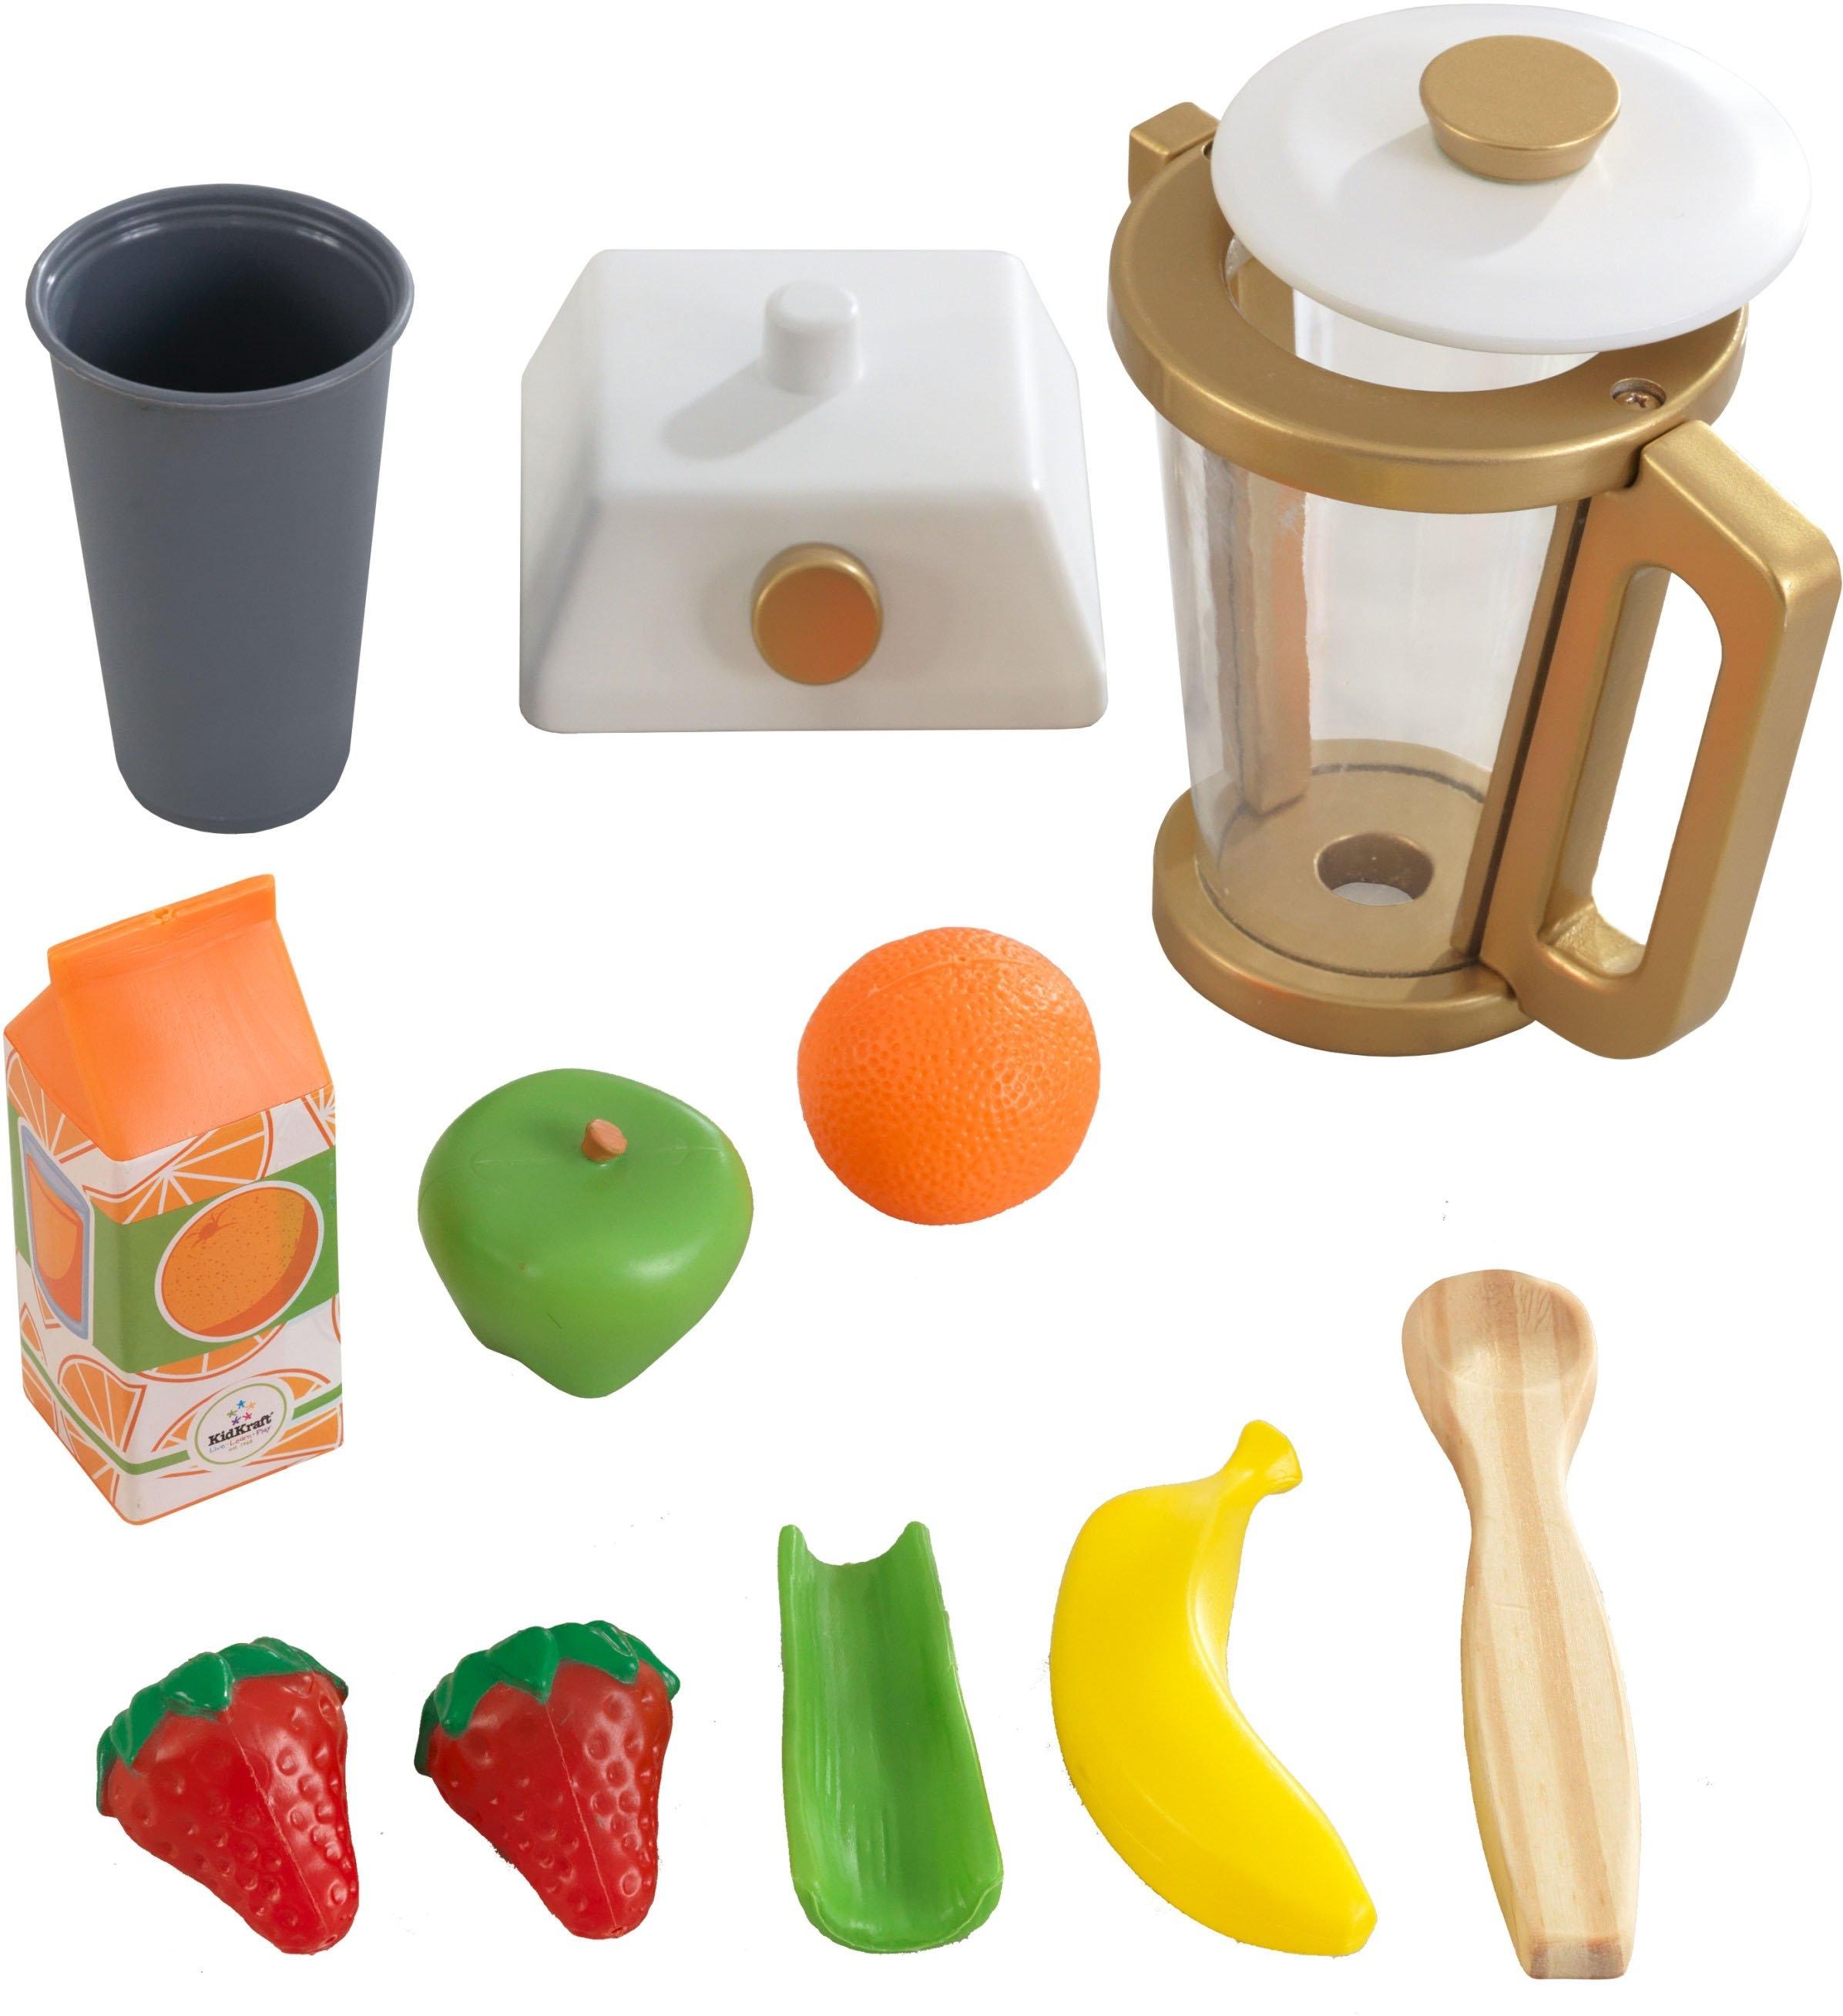 KidKraft kinderblender Speelset smoothie (12-delig) - gratis ruilen op otto.nl